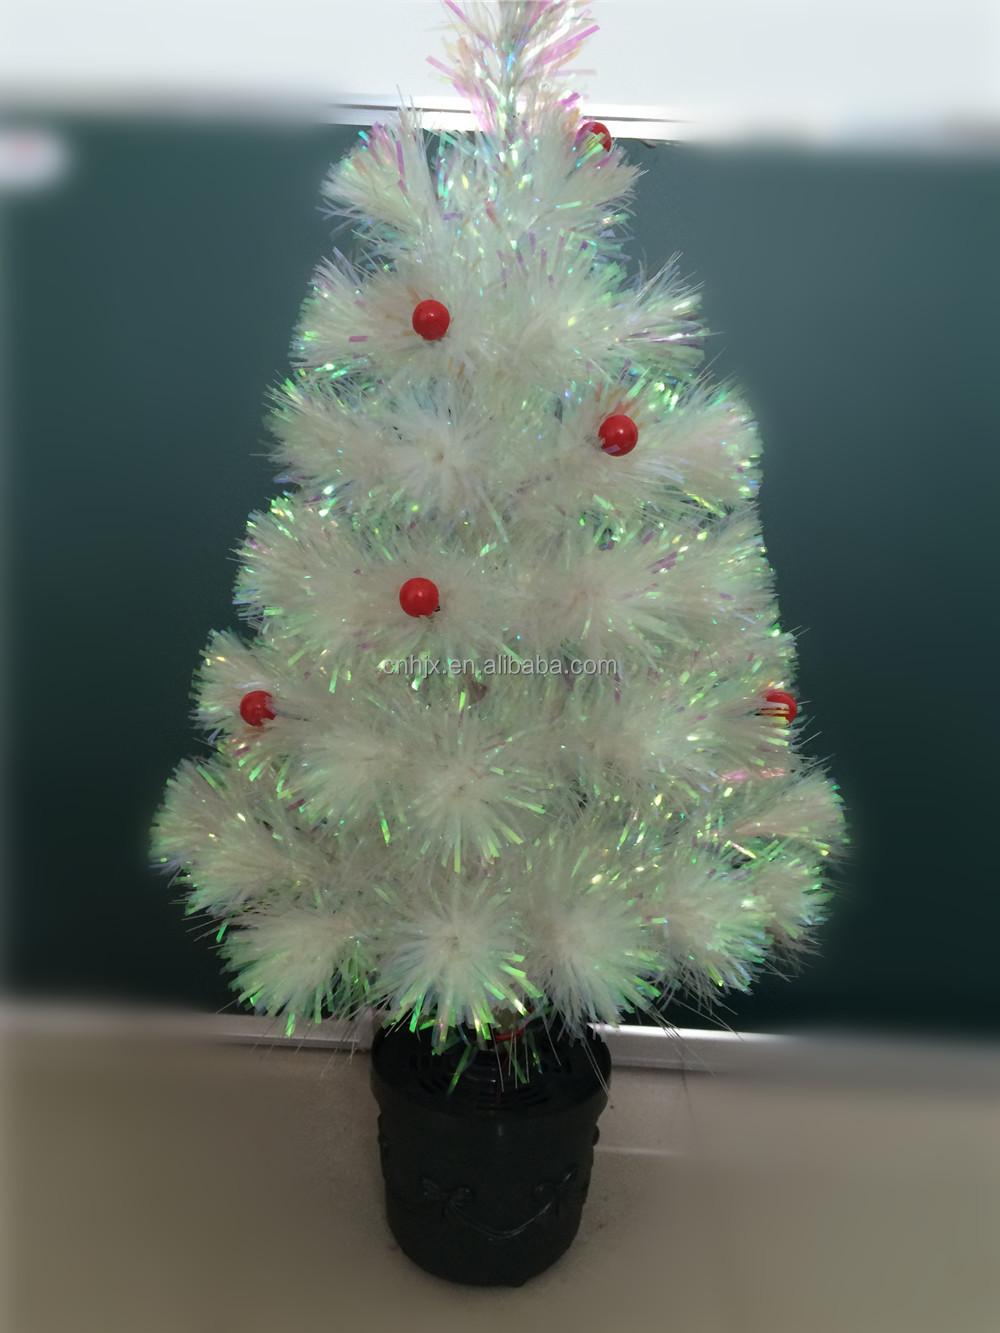 img_5062_jpg - Mini White Christmas Tree